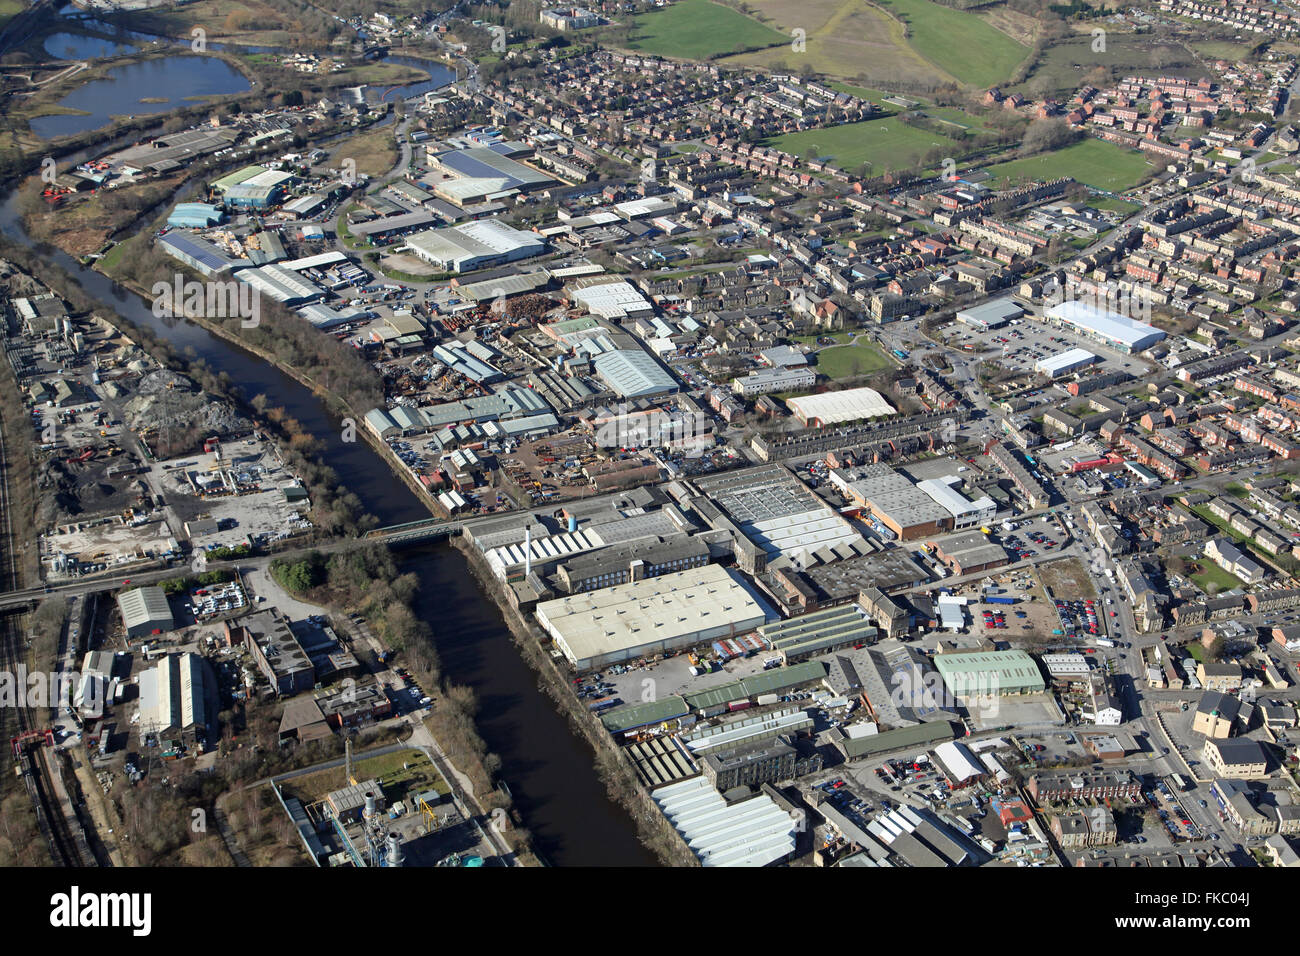 aerial view of Ravensthorpe Industrial Estate near Dewsbury in Yorkshire, UK - Stock Image